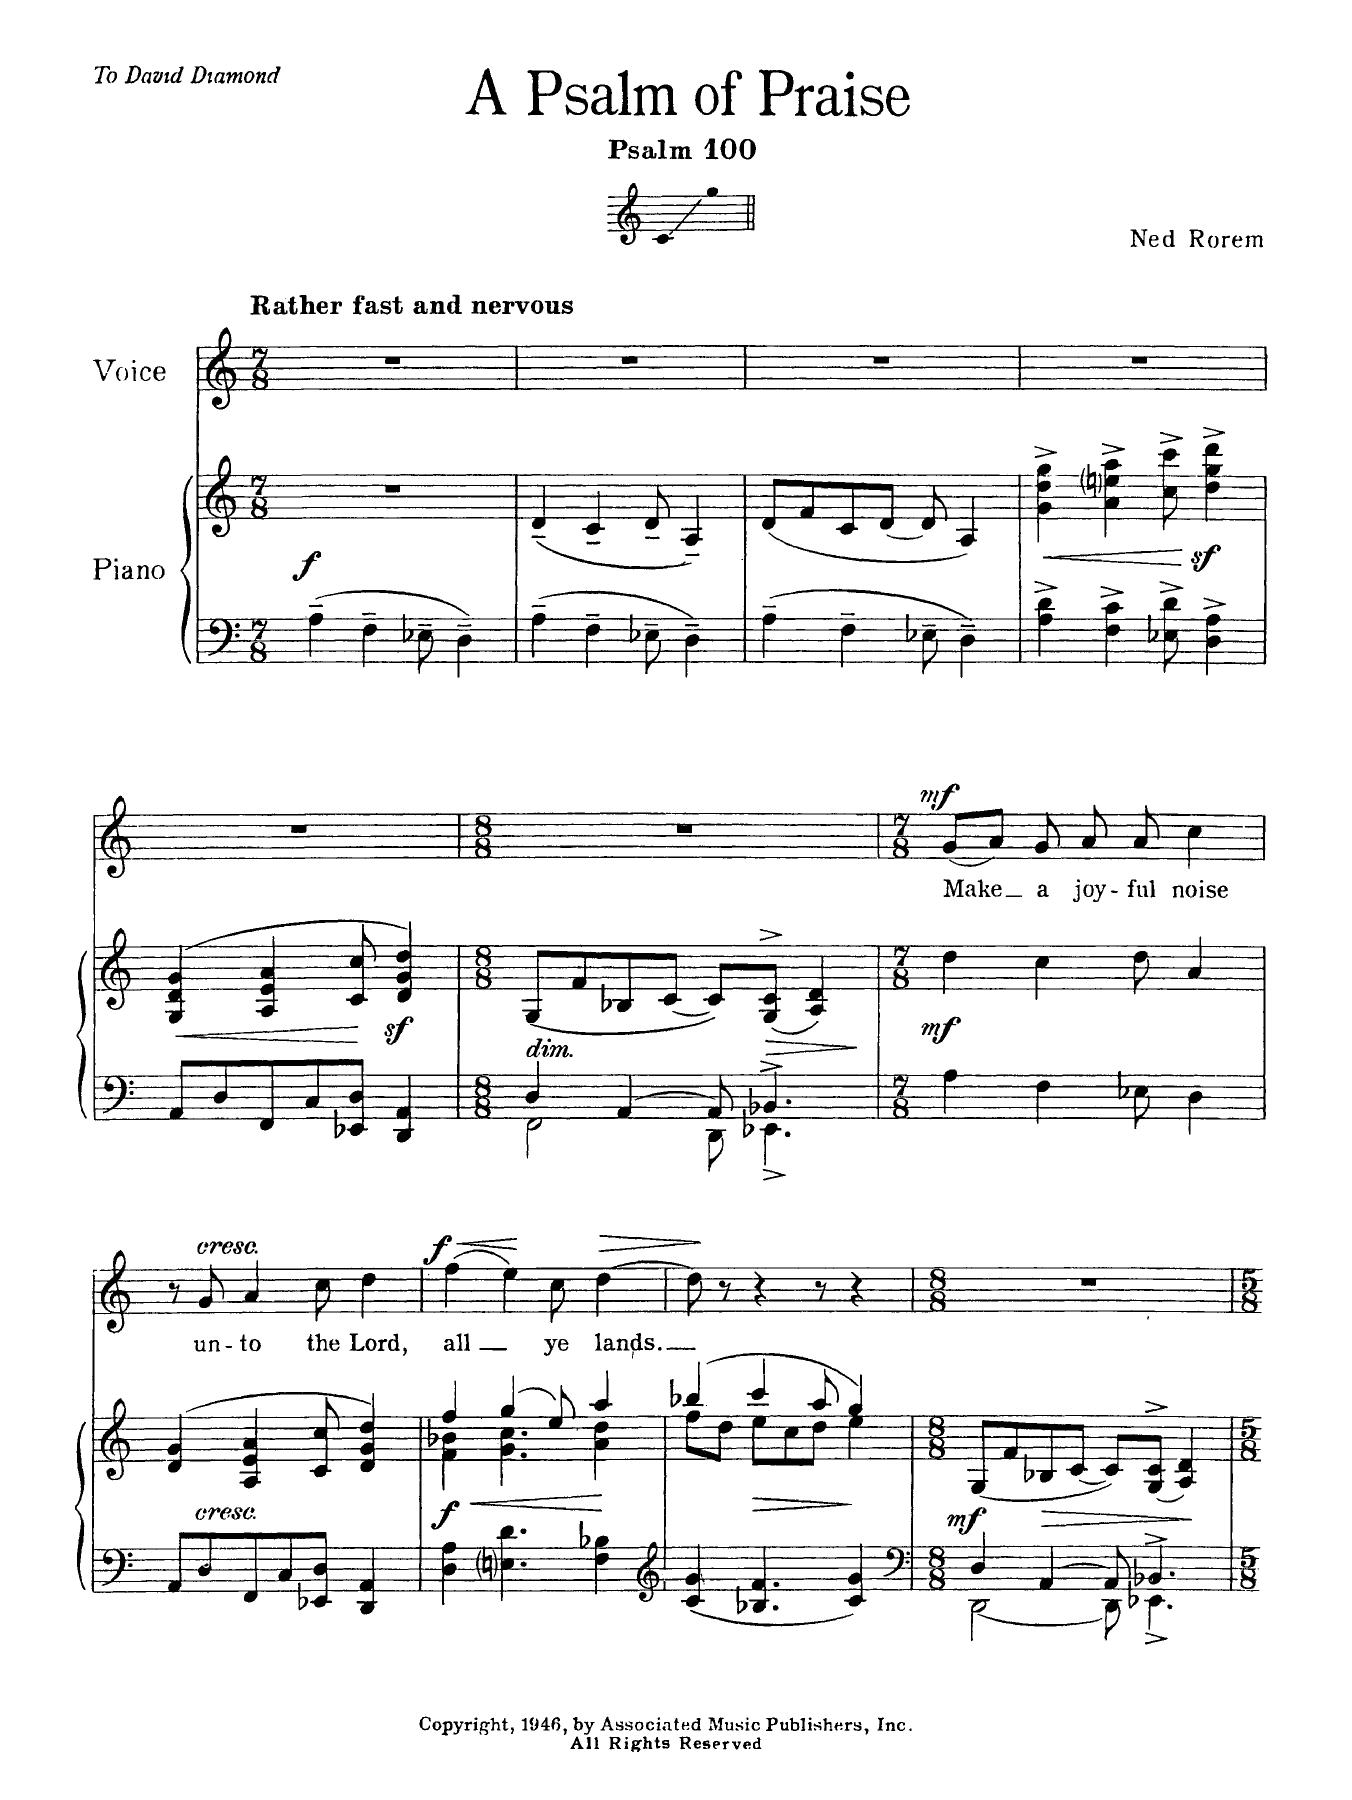 Ned Rorem - Psalm Of Praise (Psalm 100)